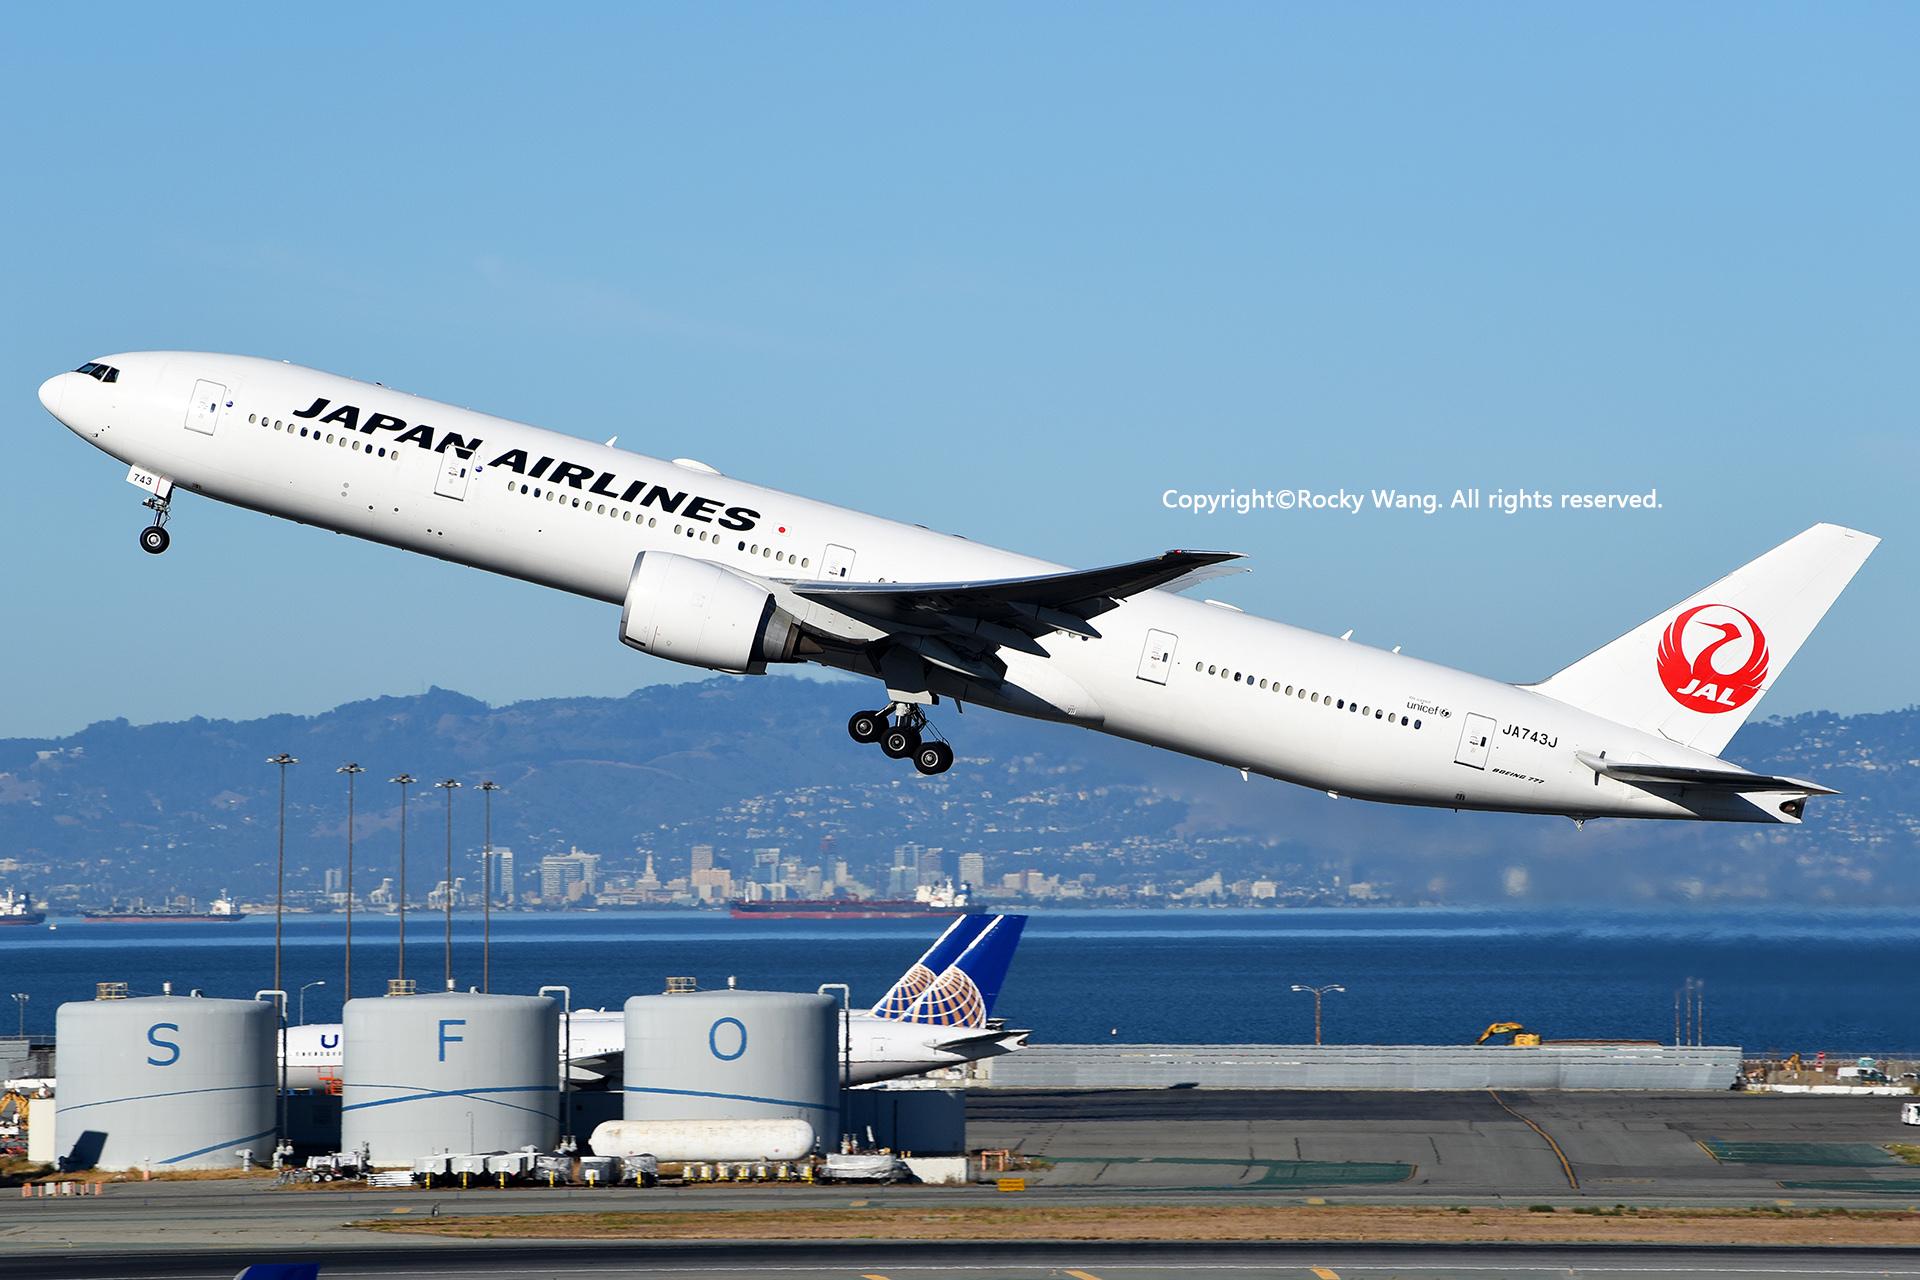 Re:[原创]居家了 批量处理老图 倾情奉献52家777 BOEING 777-346ER JA743J San Francisco Int'l Airport